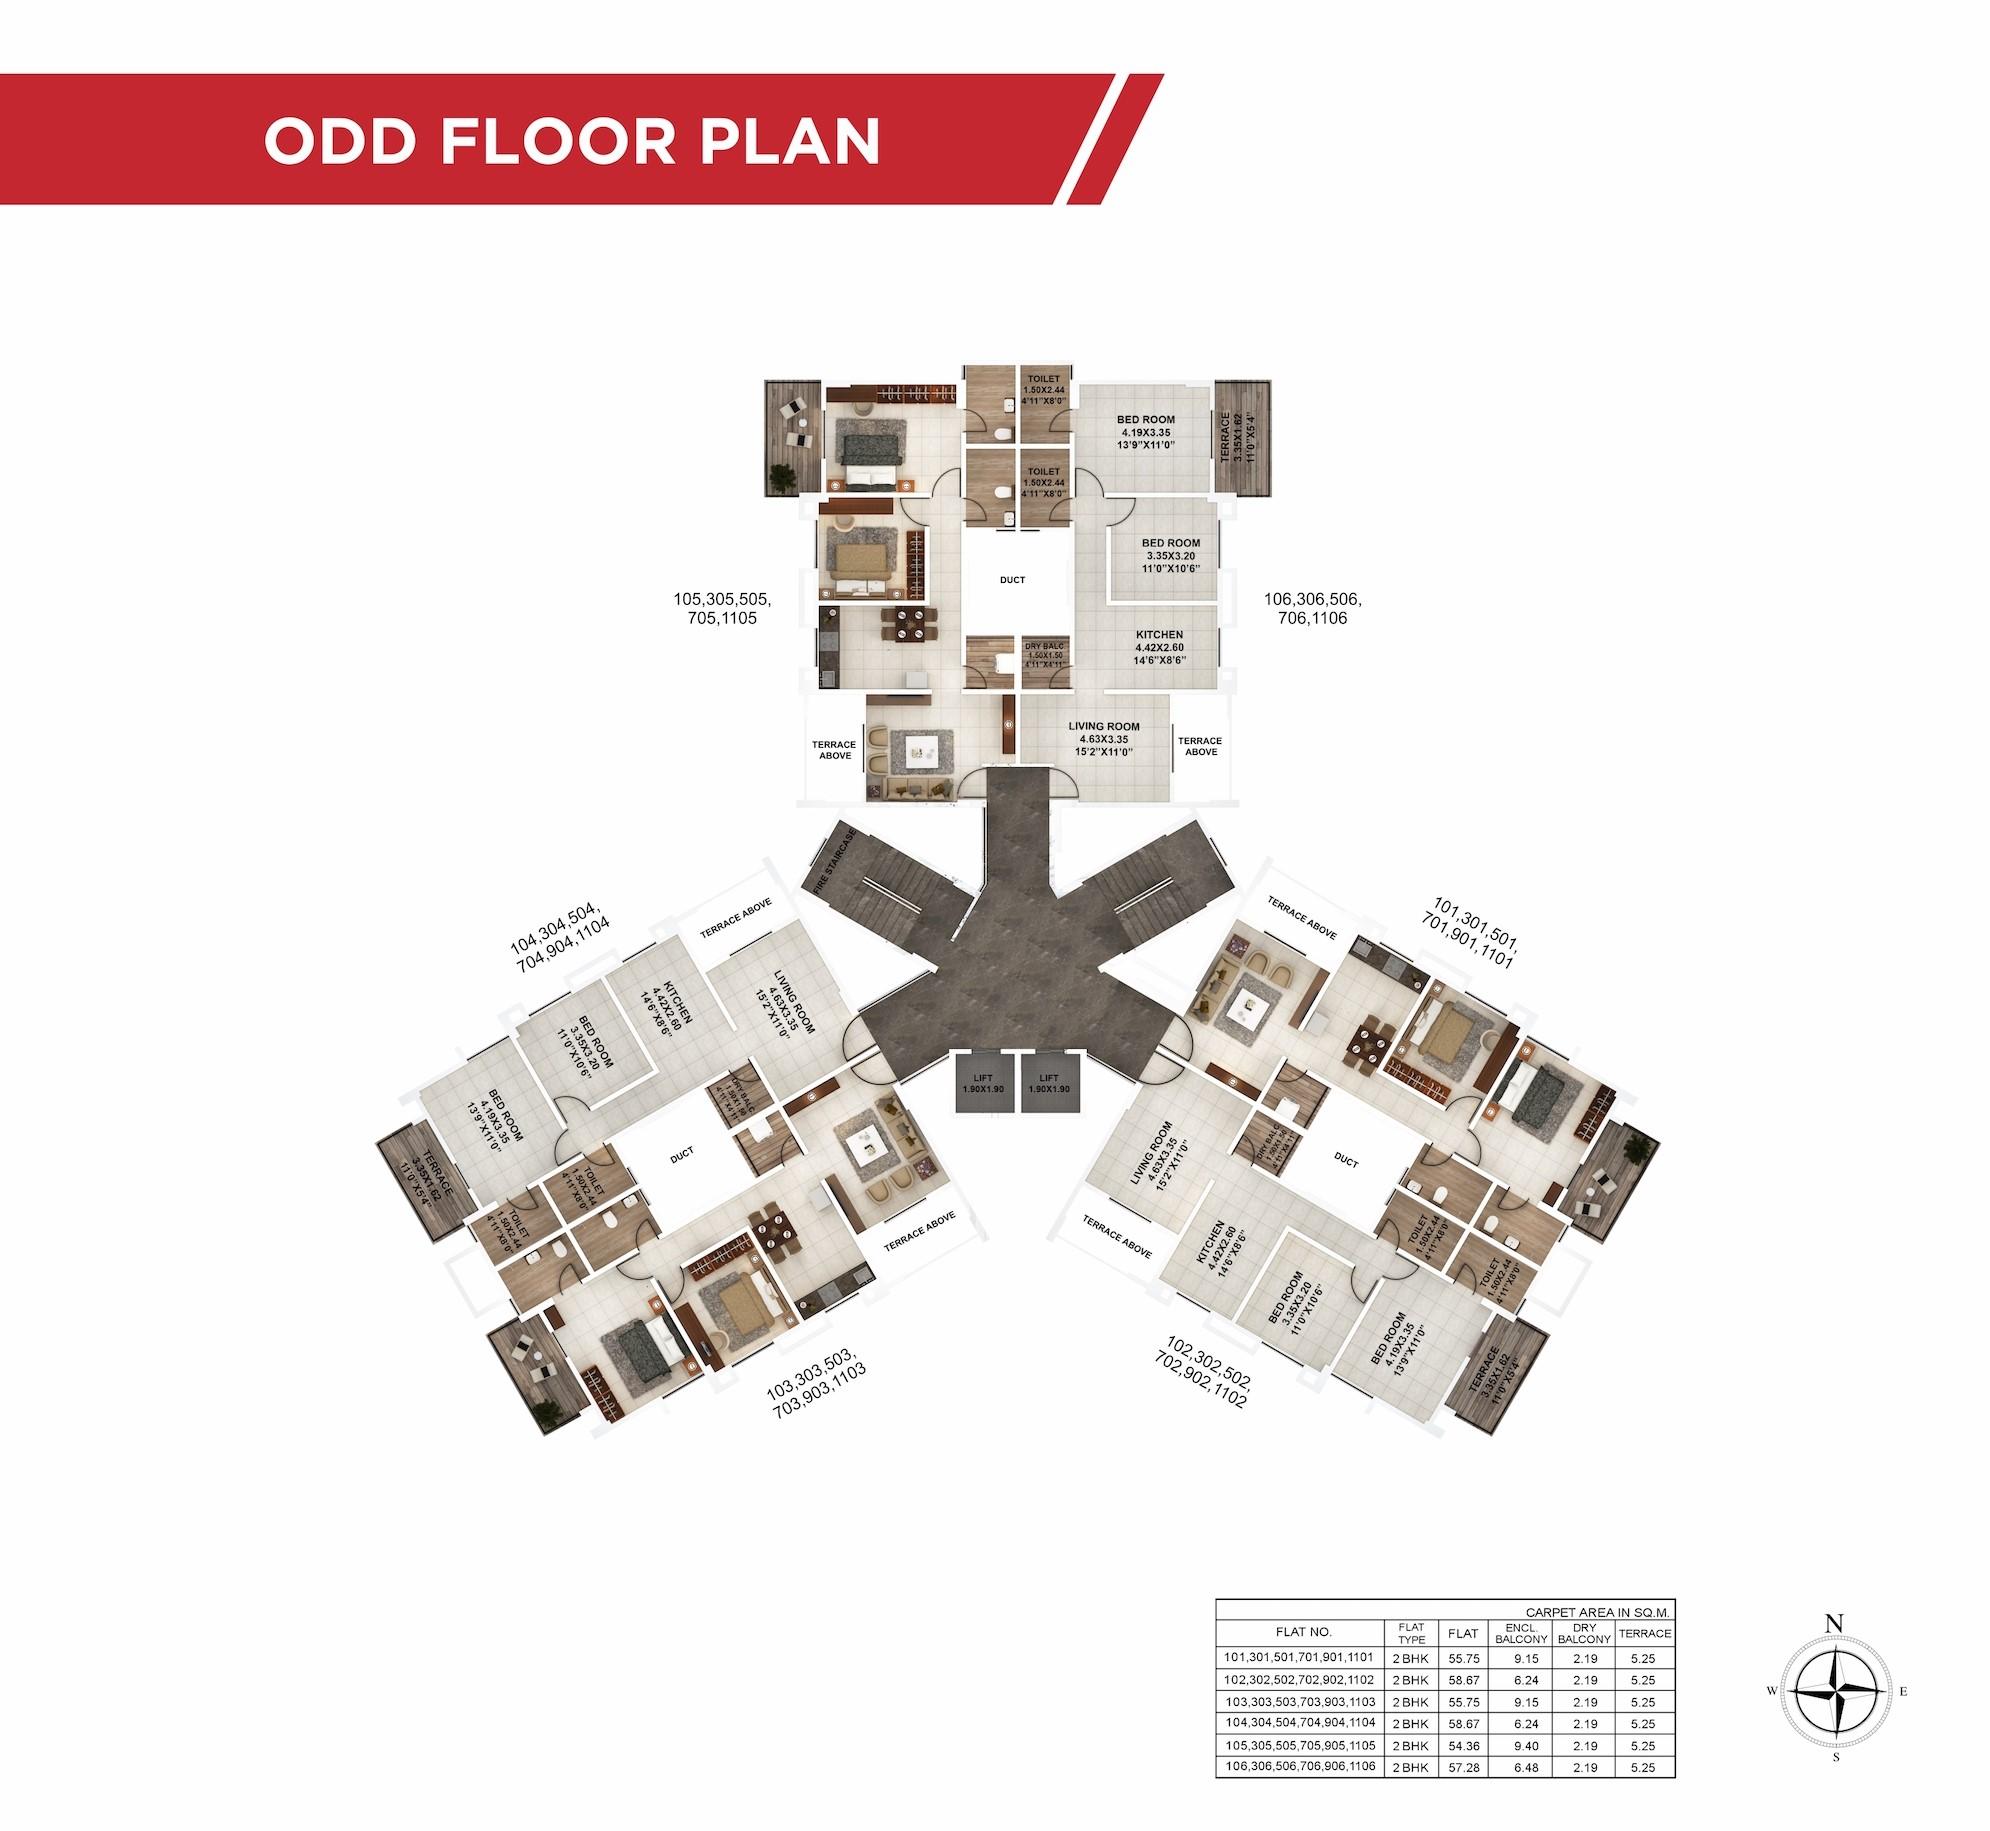 Palmcrest Odd Floor Plan